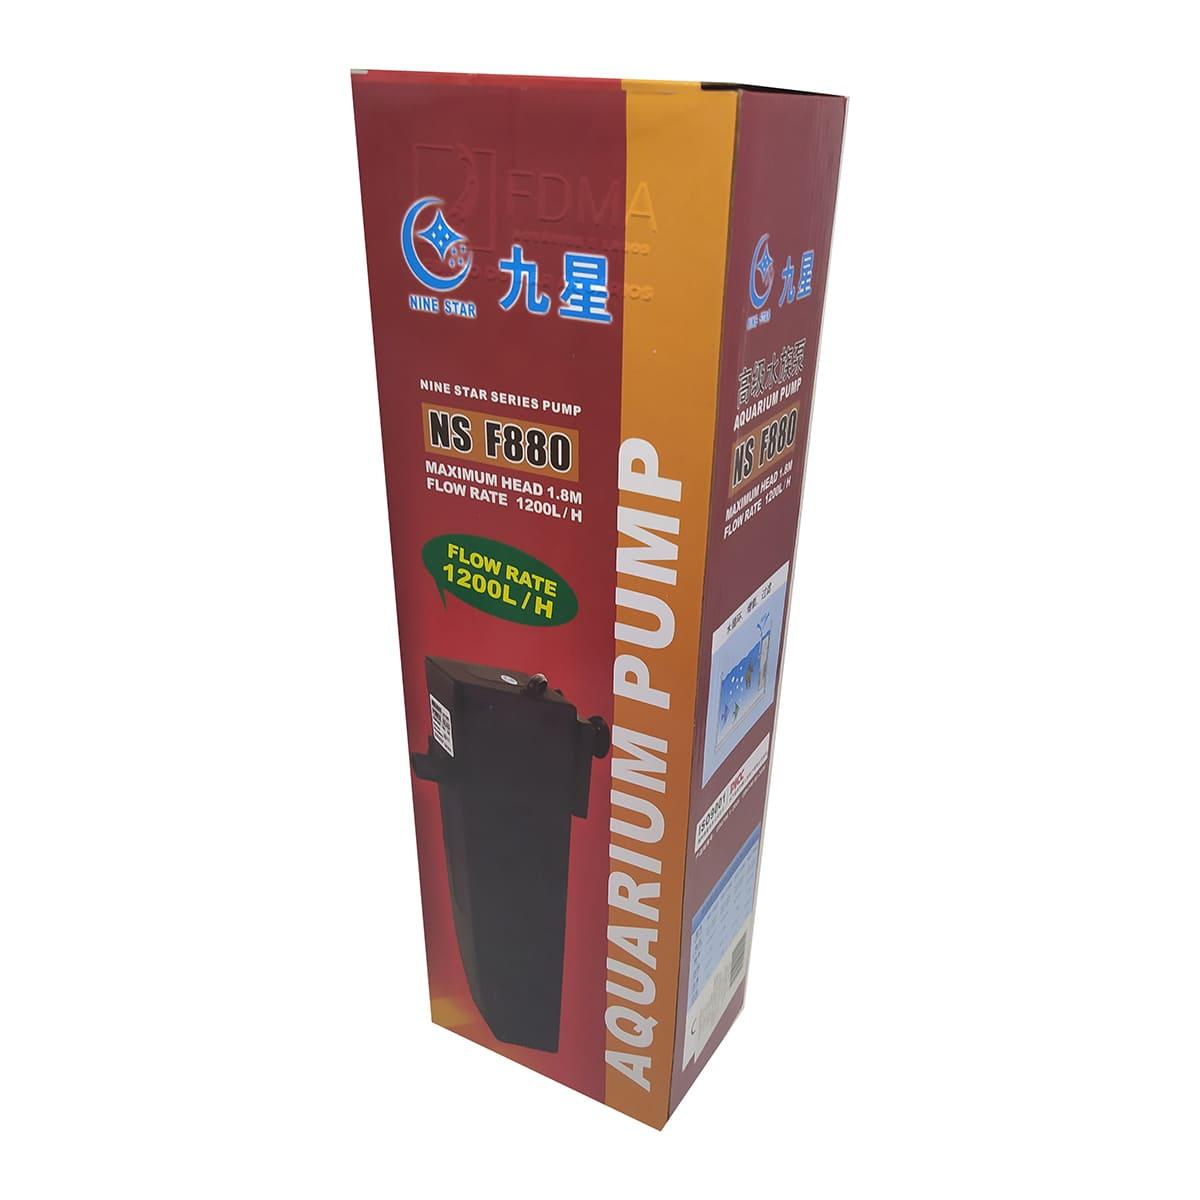 Filtro Interno Minjiang Ns F880 1200l/h Aquários até 150L